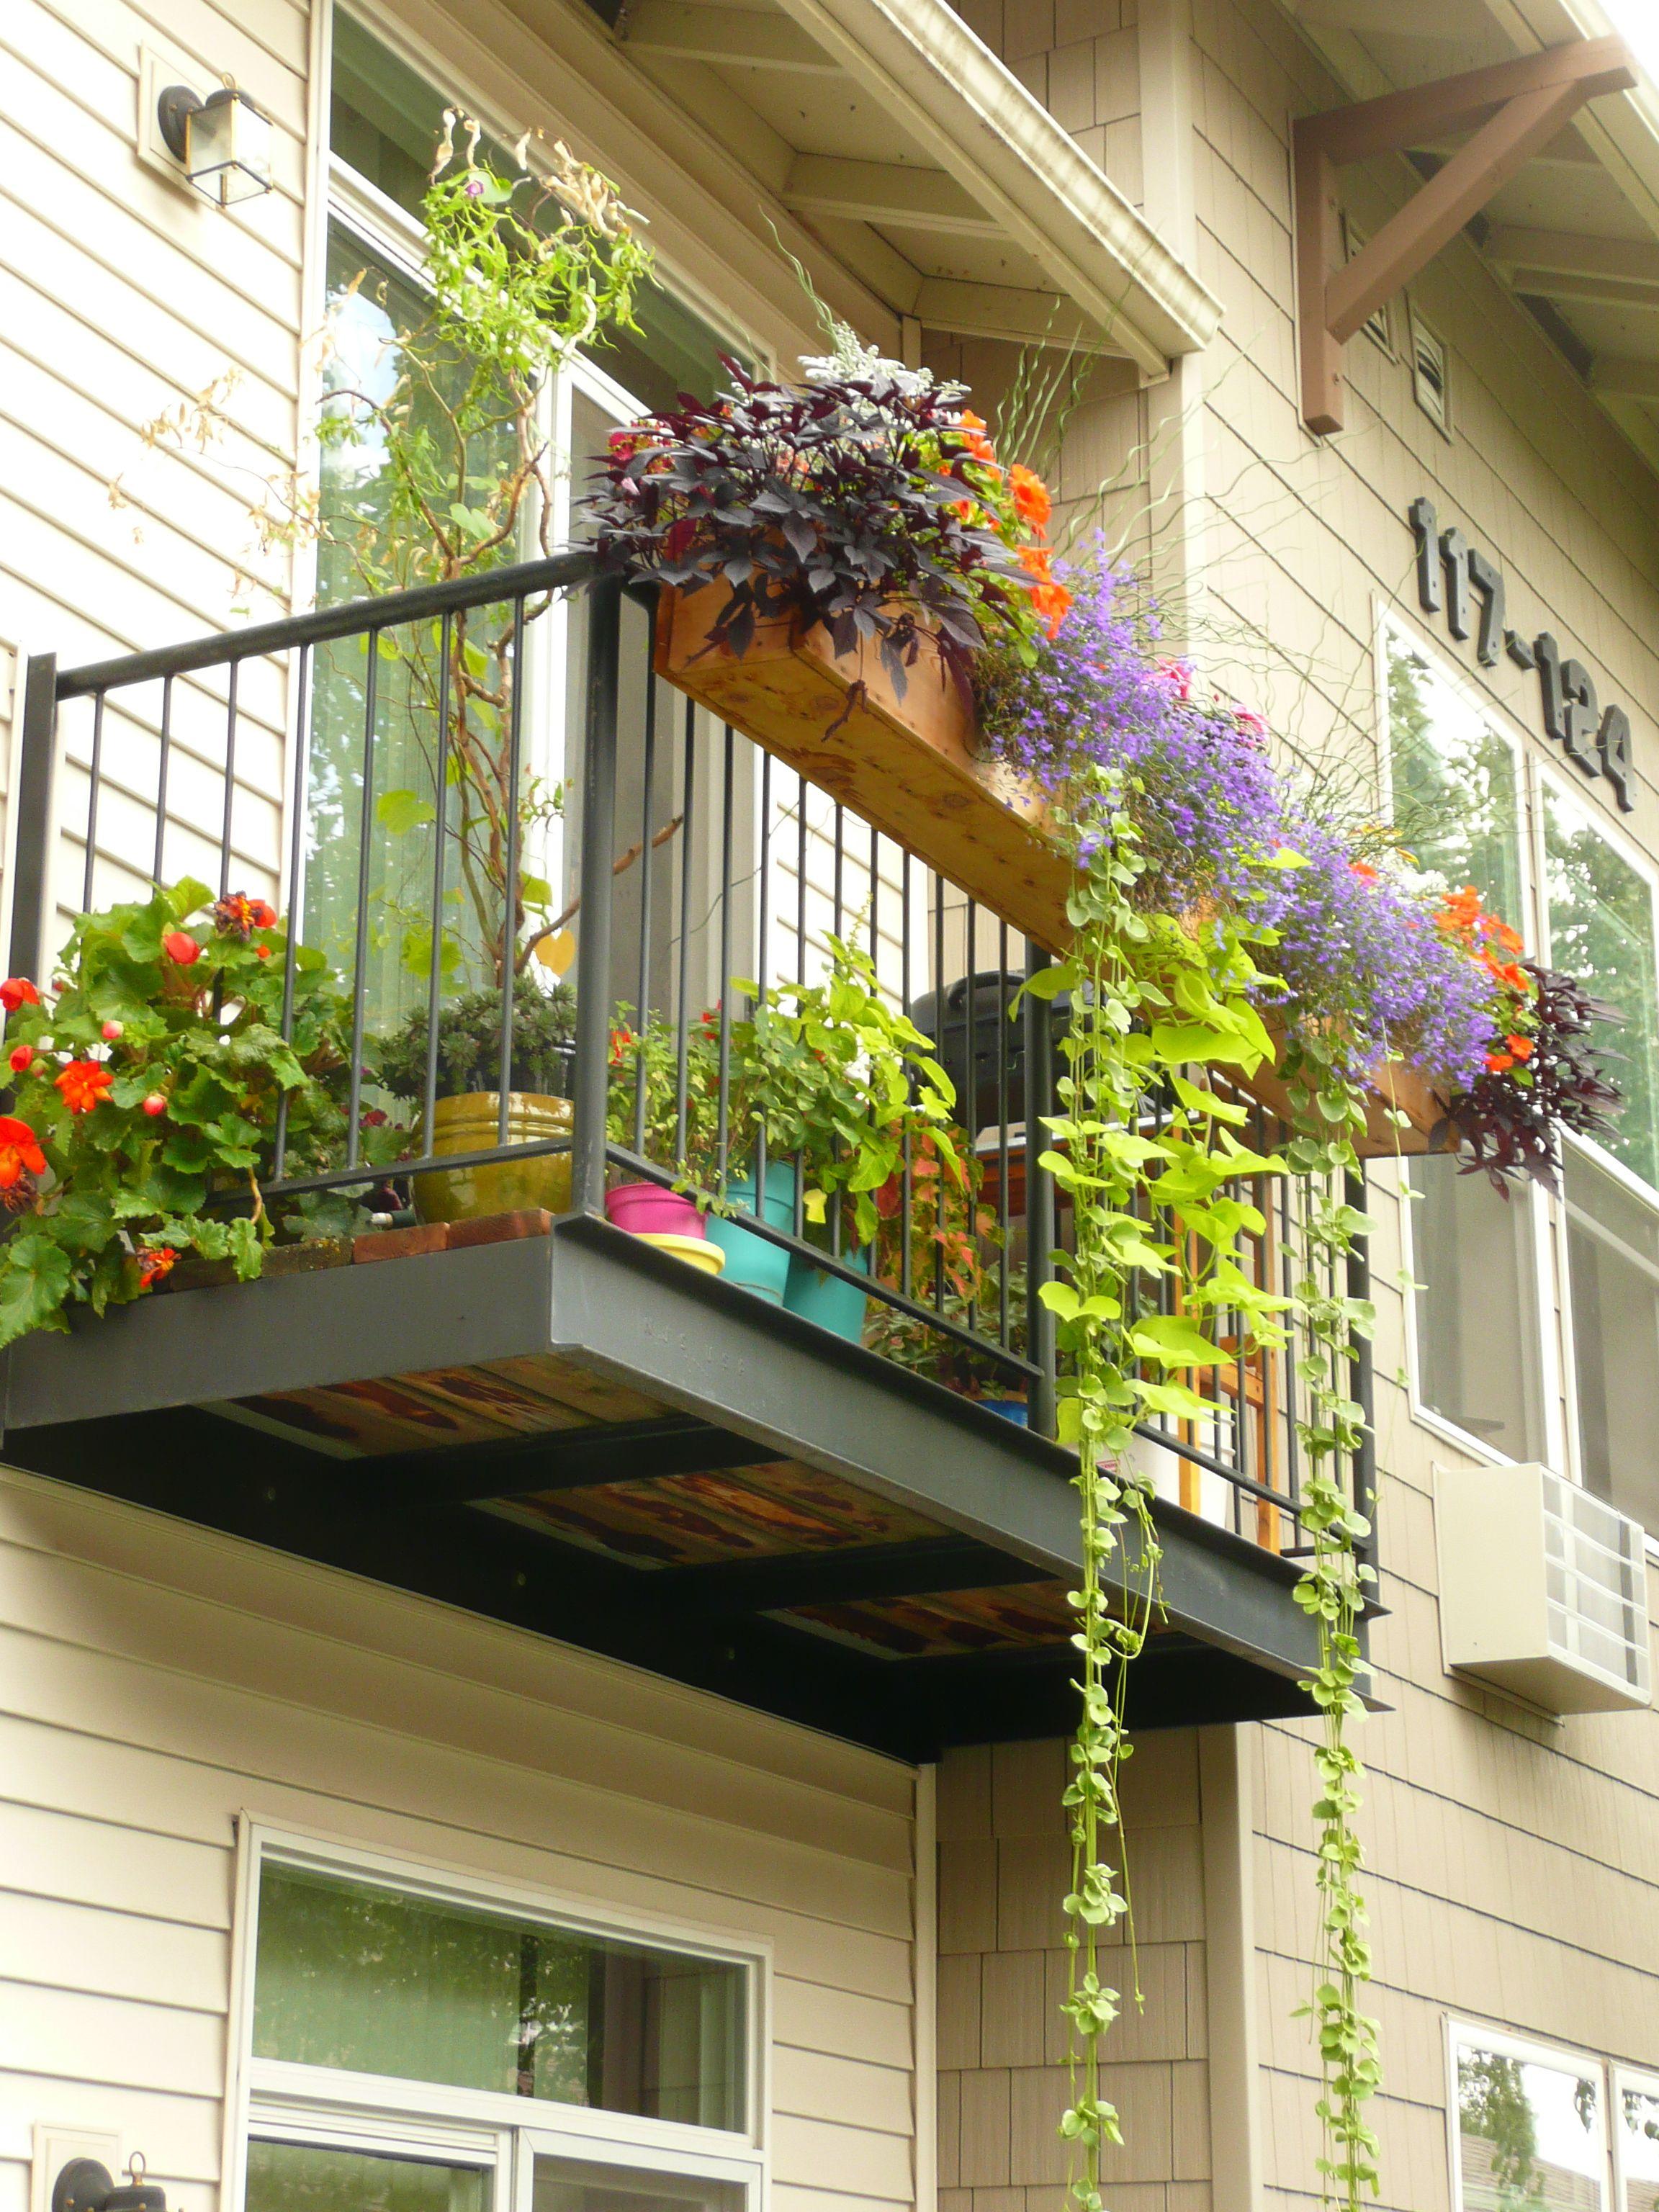 Apartment Patio Deck Summer. Diy 7' Cedar Planter